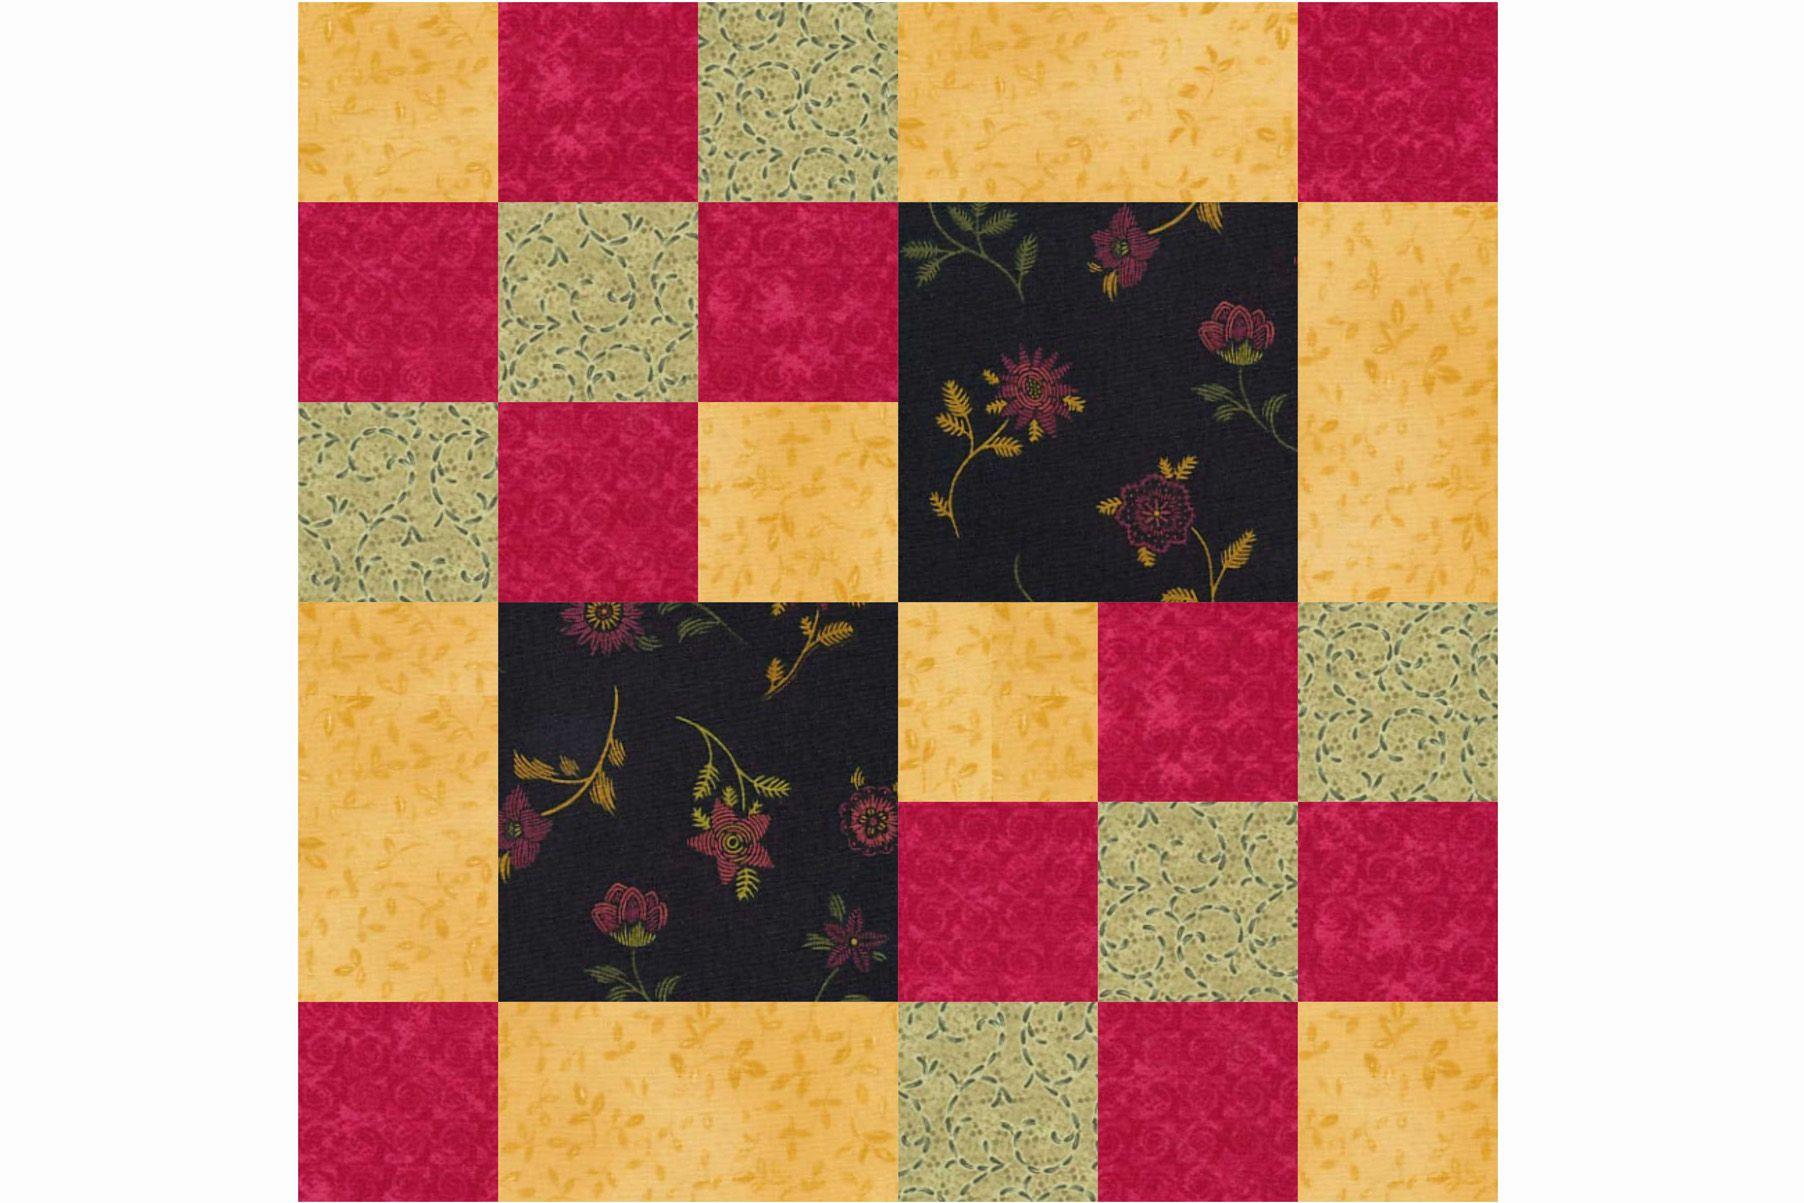 Free 12 Inch Quilt Block Patterns : names of quilt blocks - Adamdwight.com